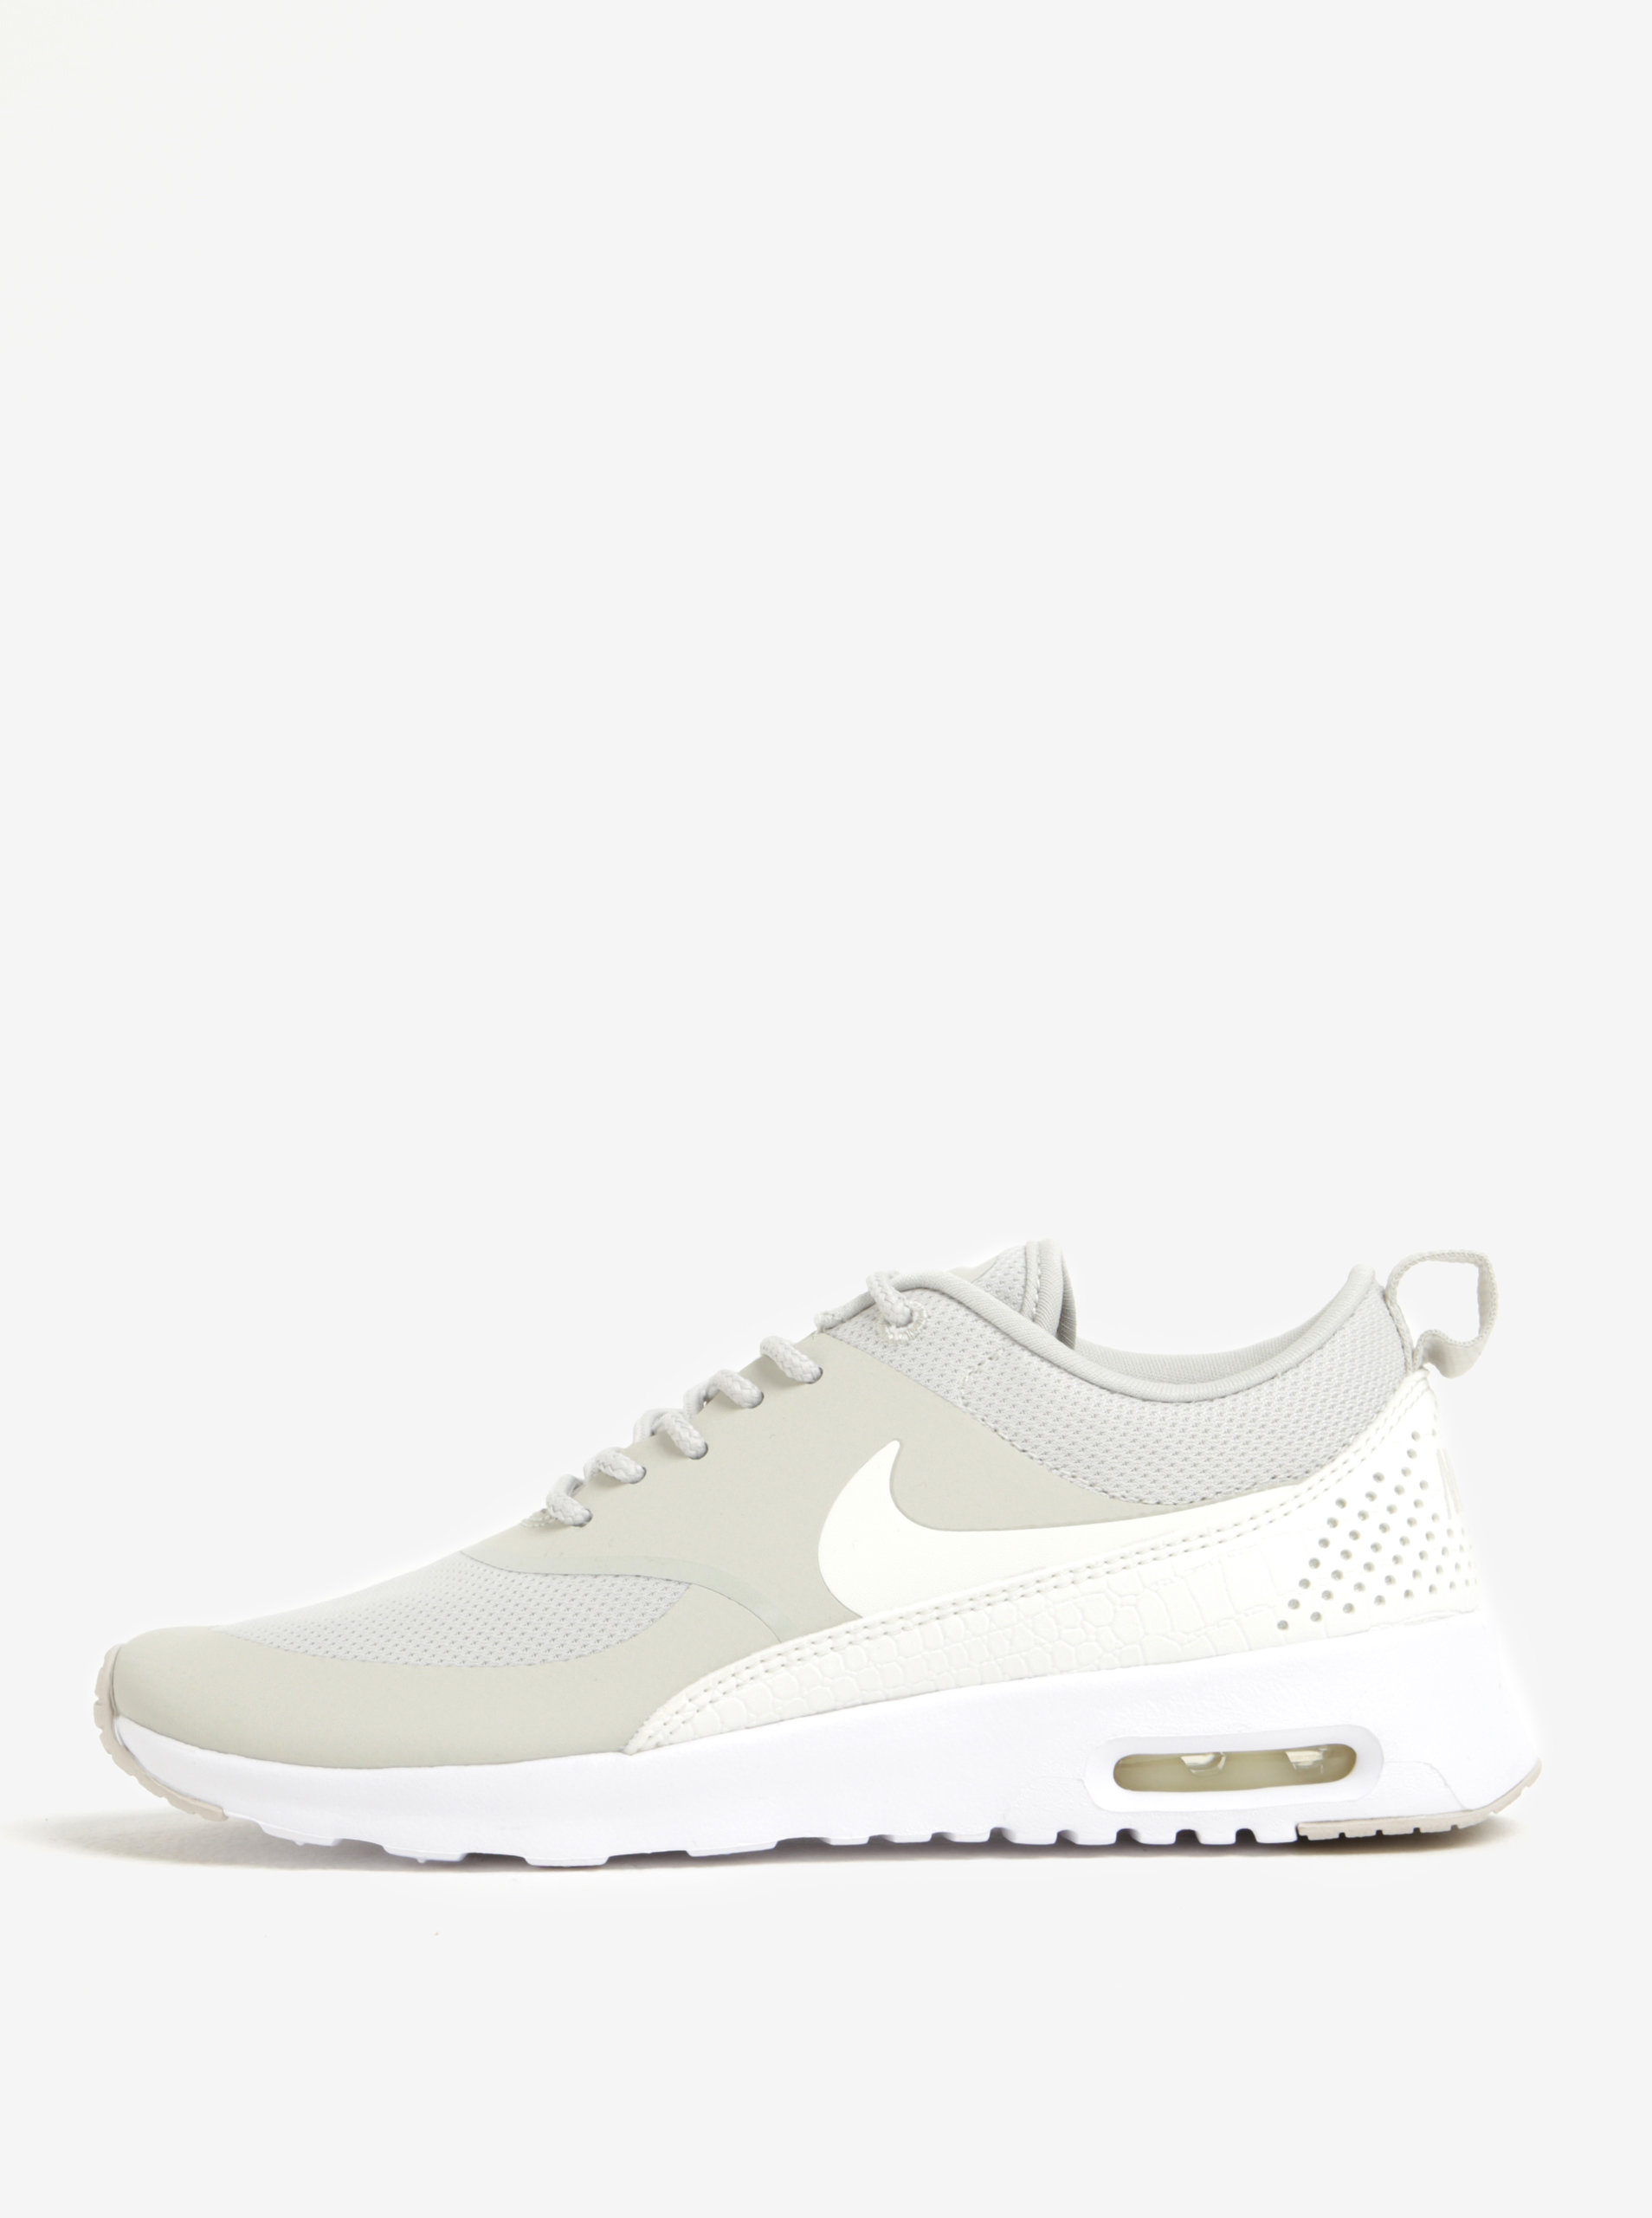 Sivé dámske tenisky Nike Air Max Thea ... 4455ecfade2